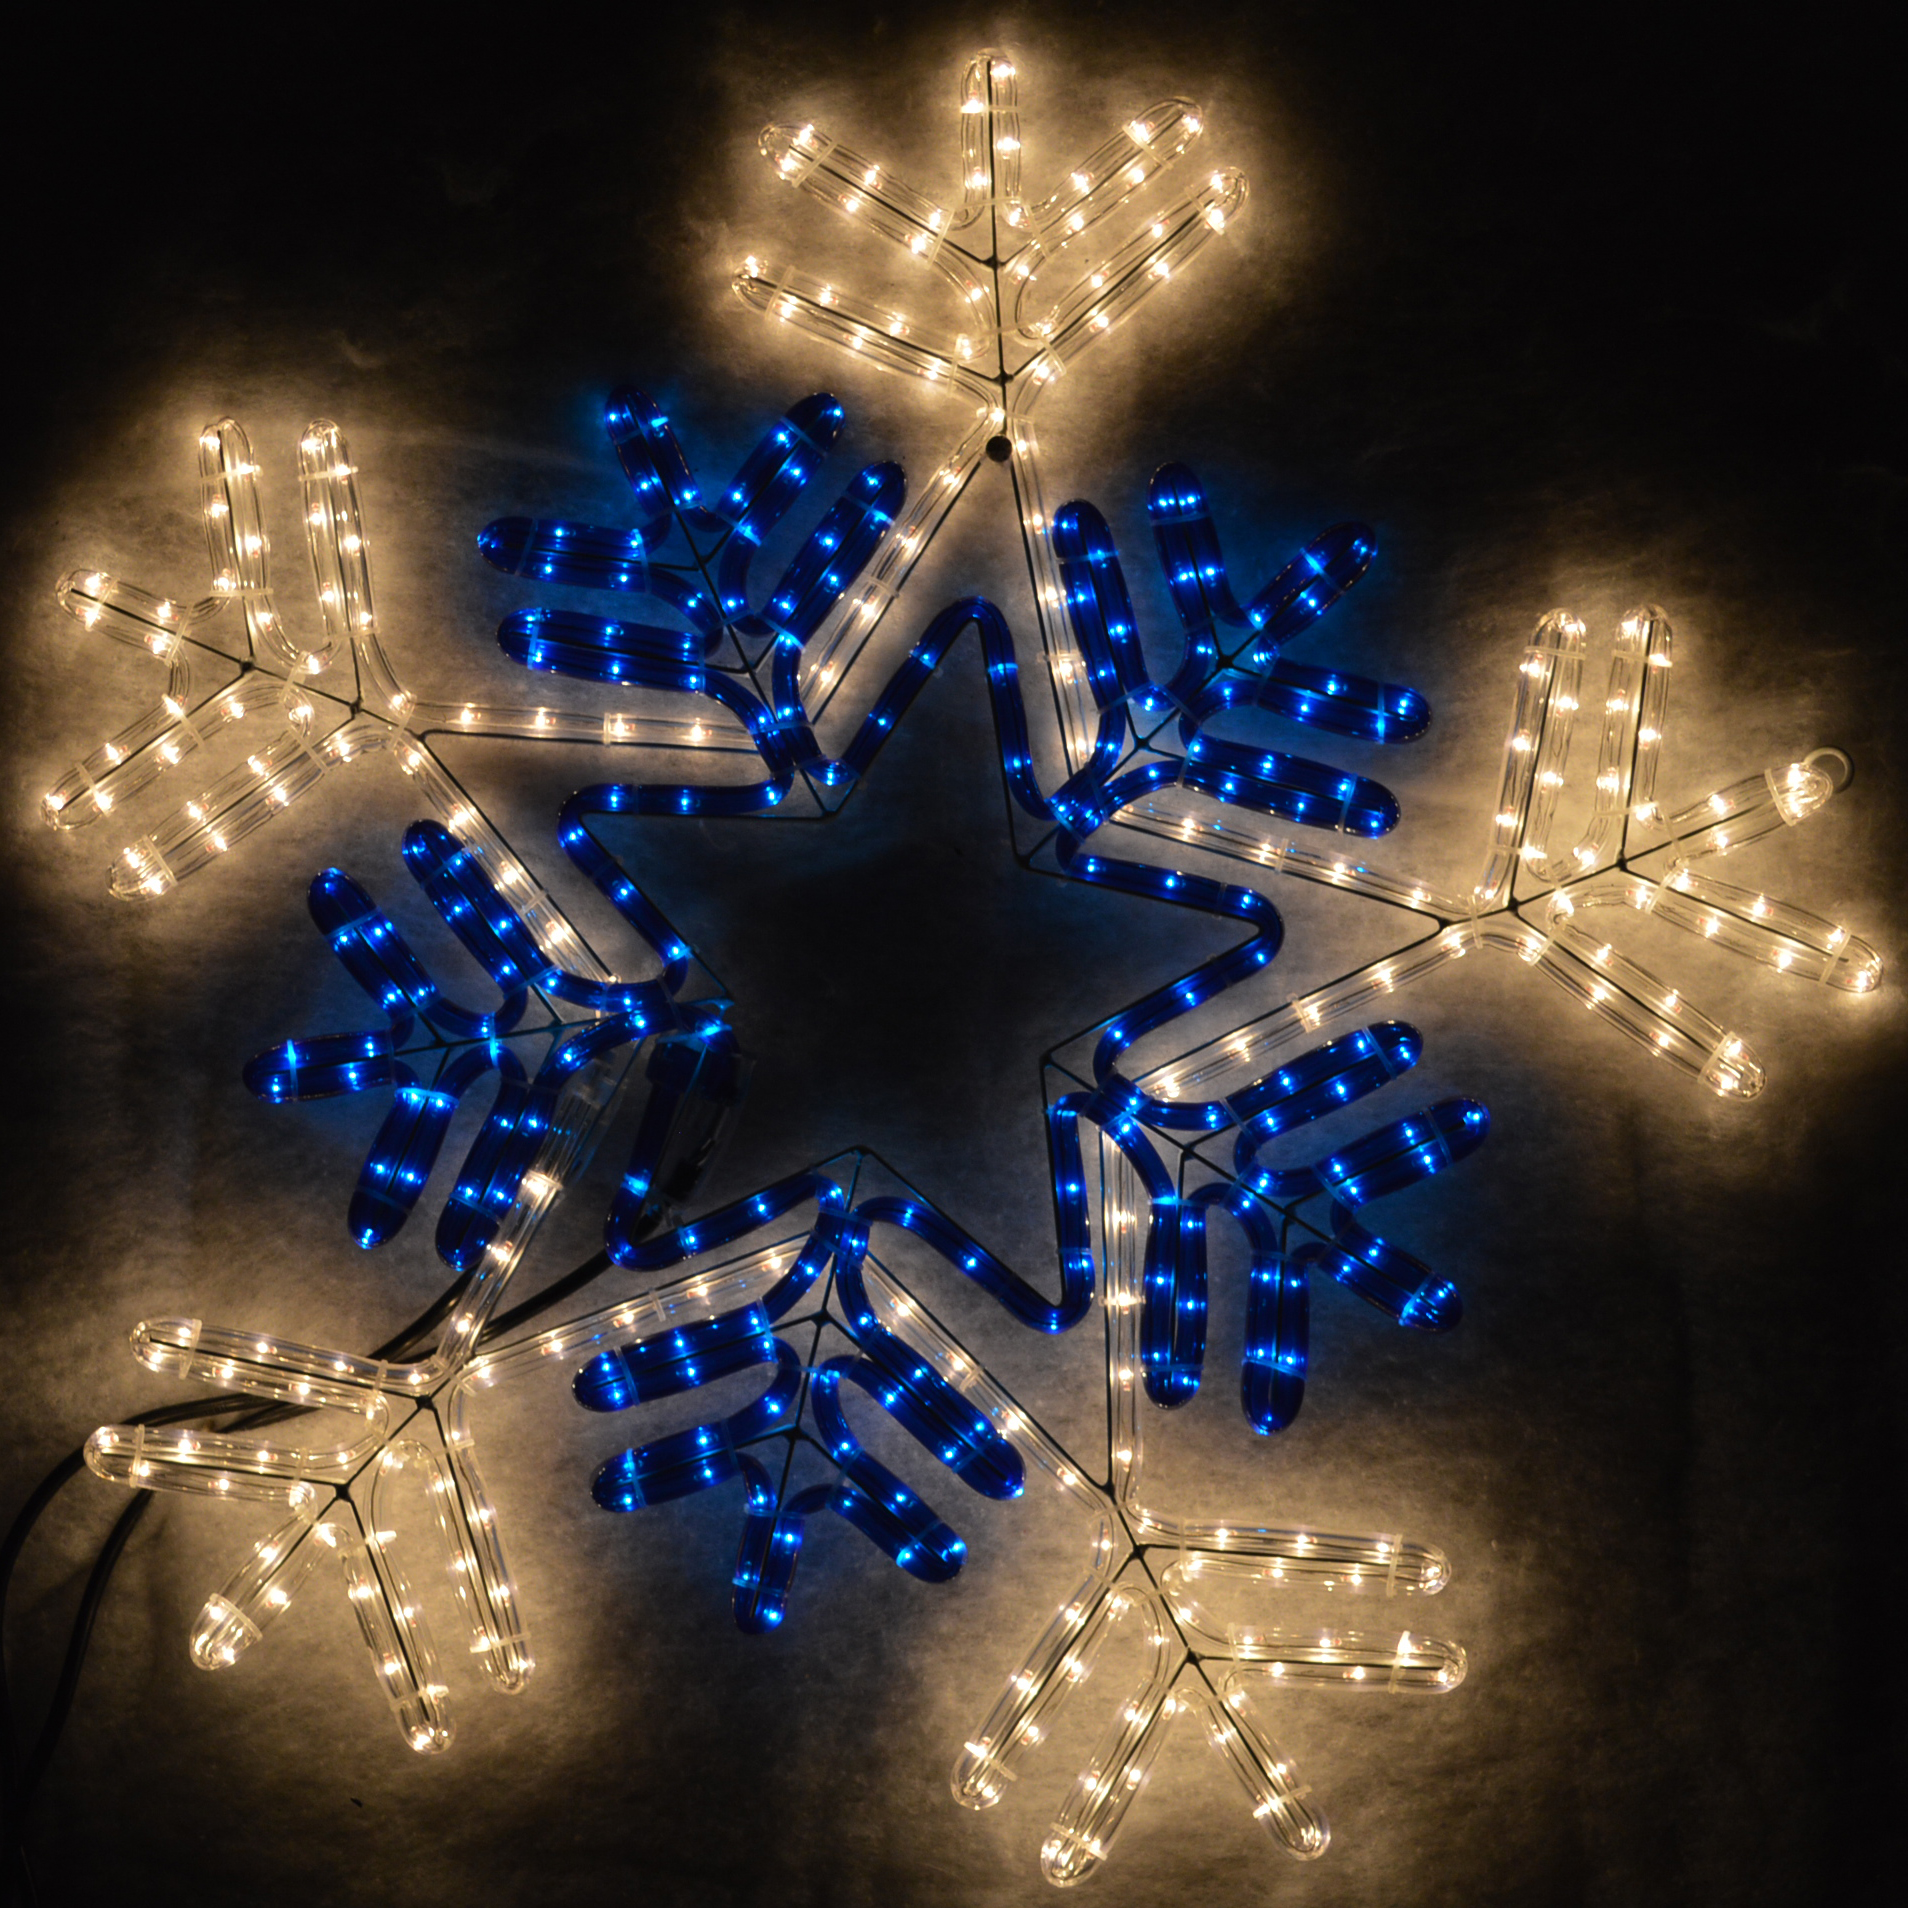 66Cm Multi Function Flashing Snowflake Outdoor Christmas Silhouette Decoration